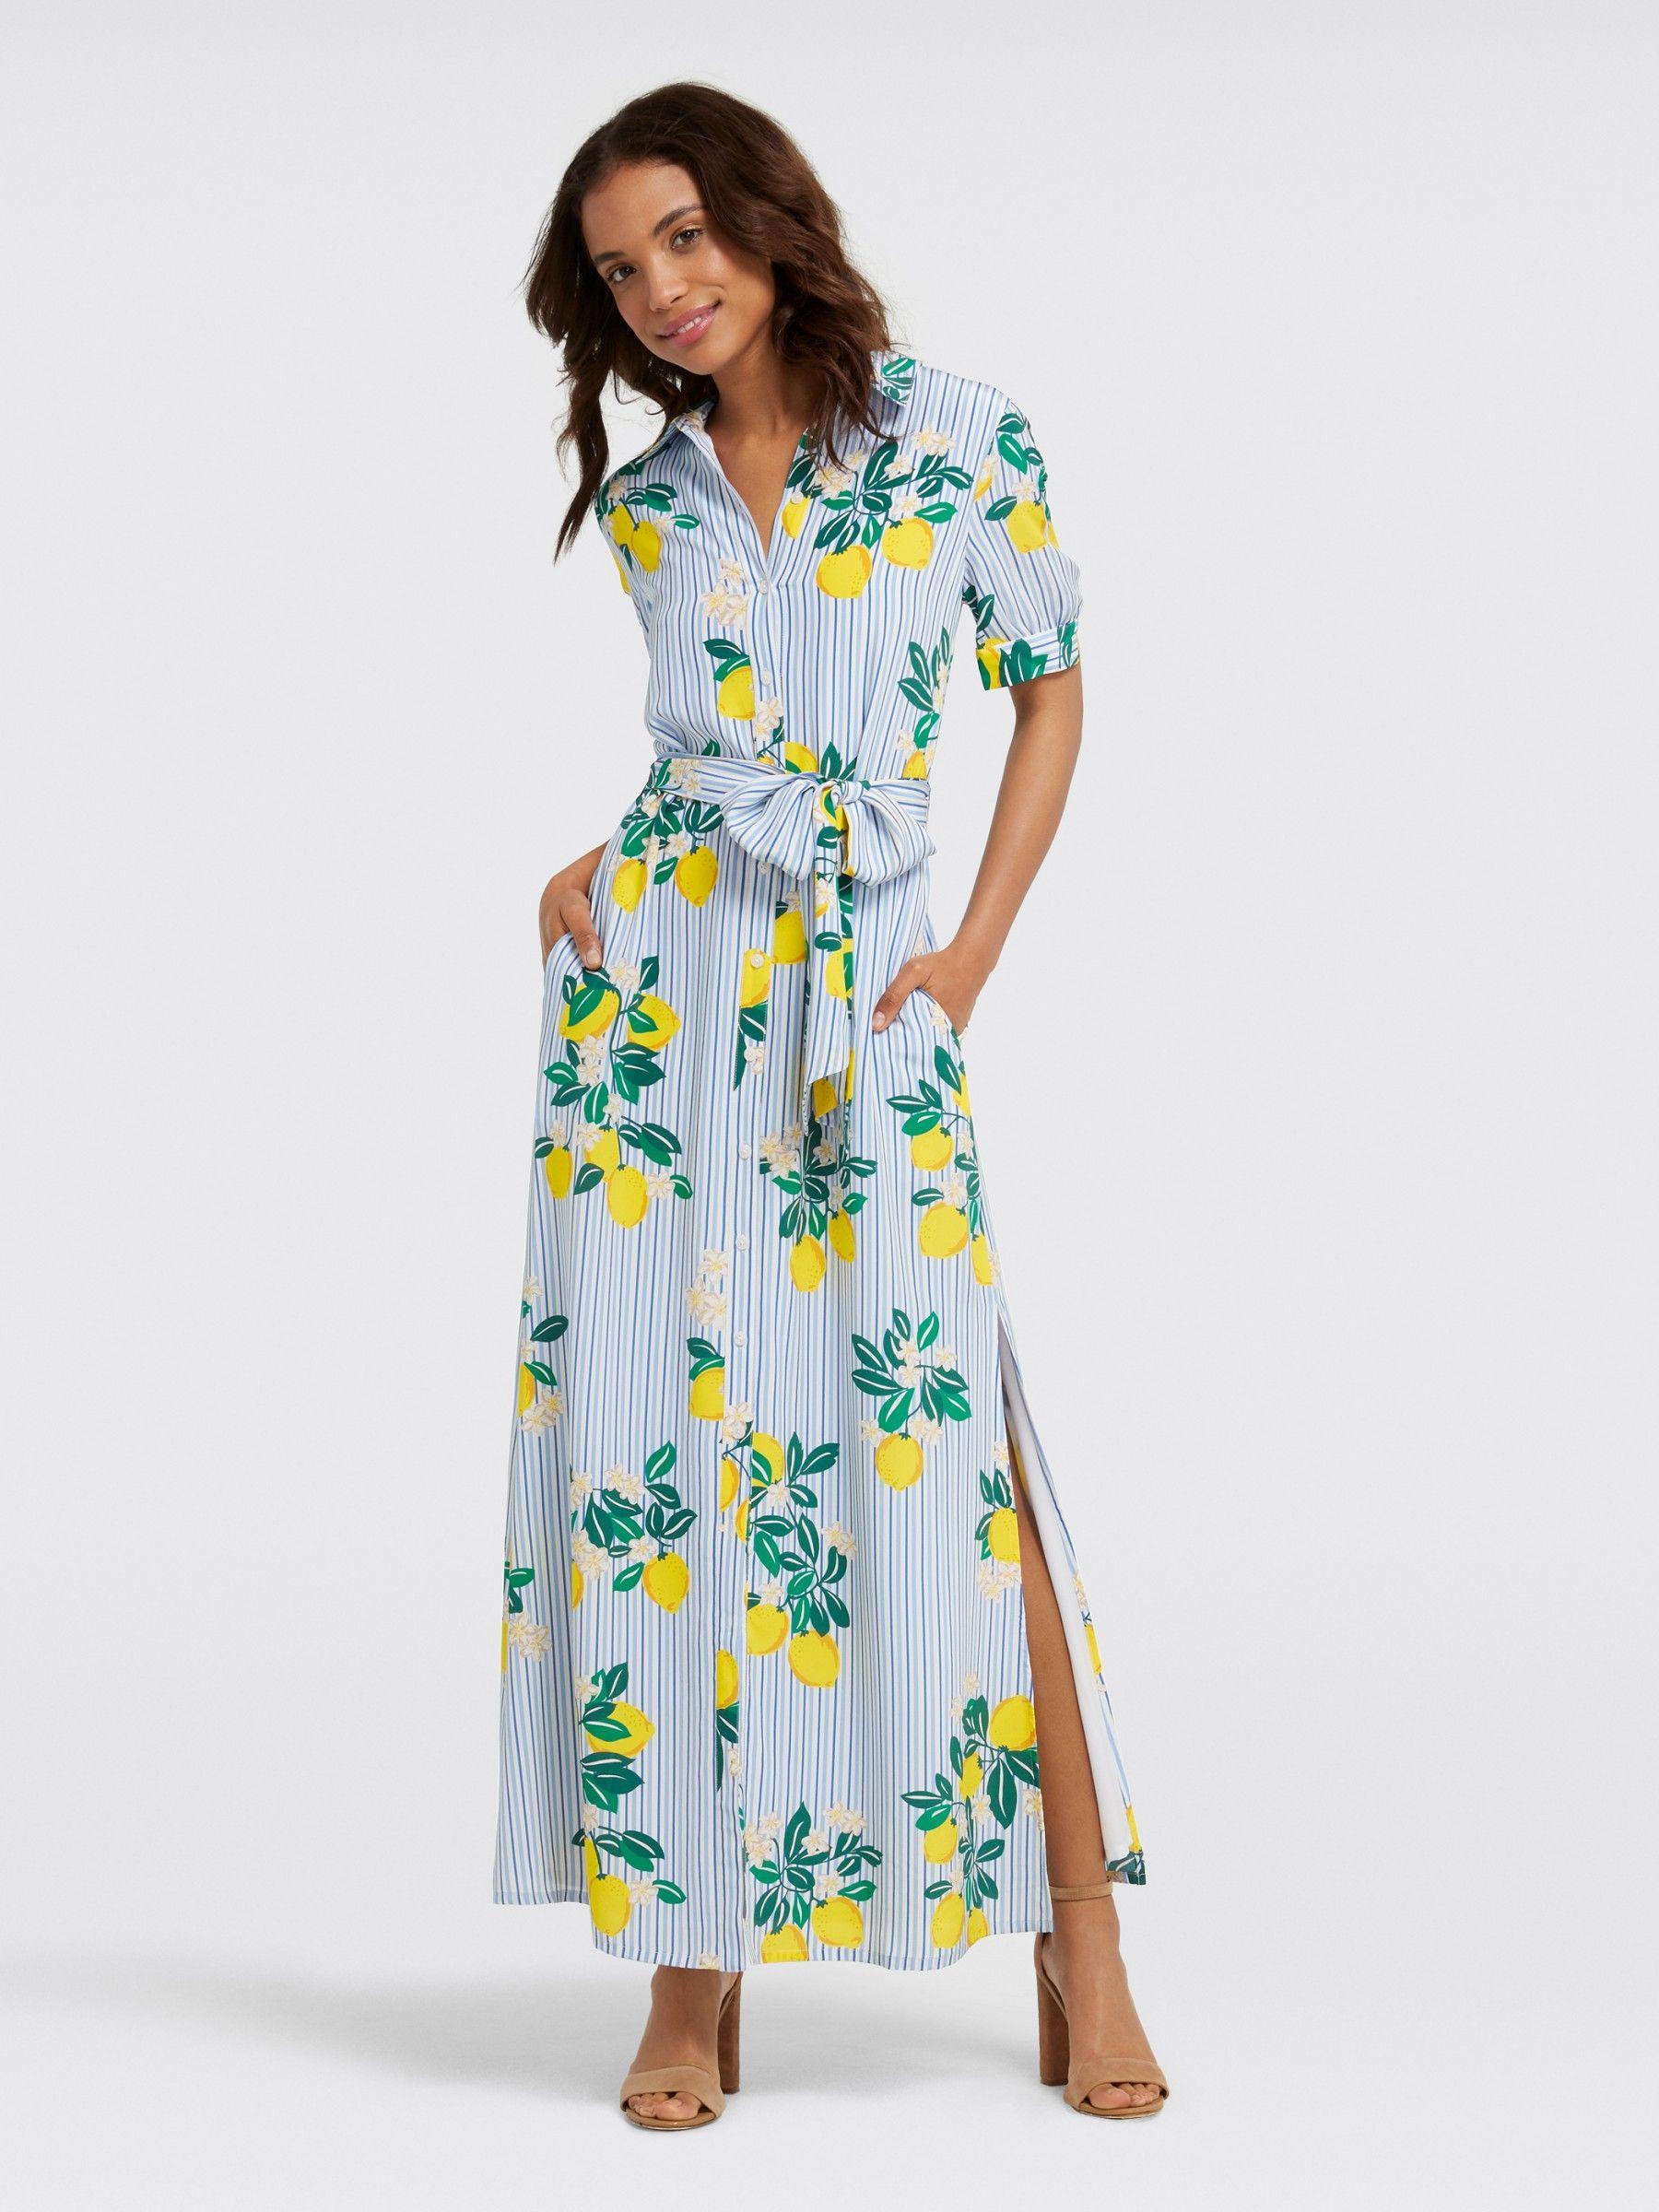 83f16d29c95 Collection Lemon Blossom Floral Maxi Dress - Clothing